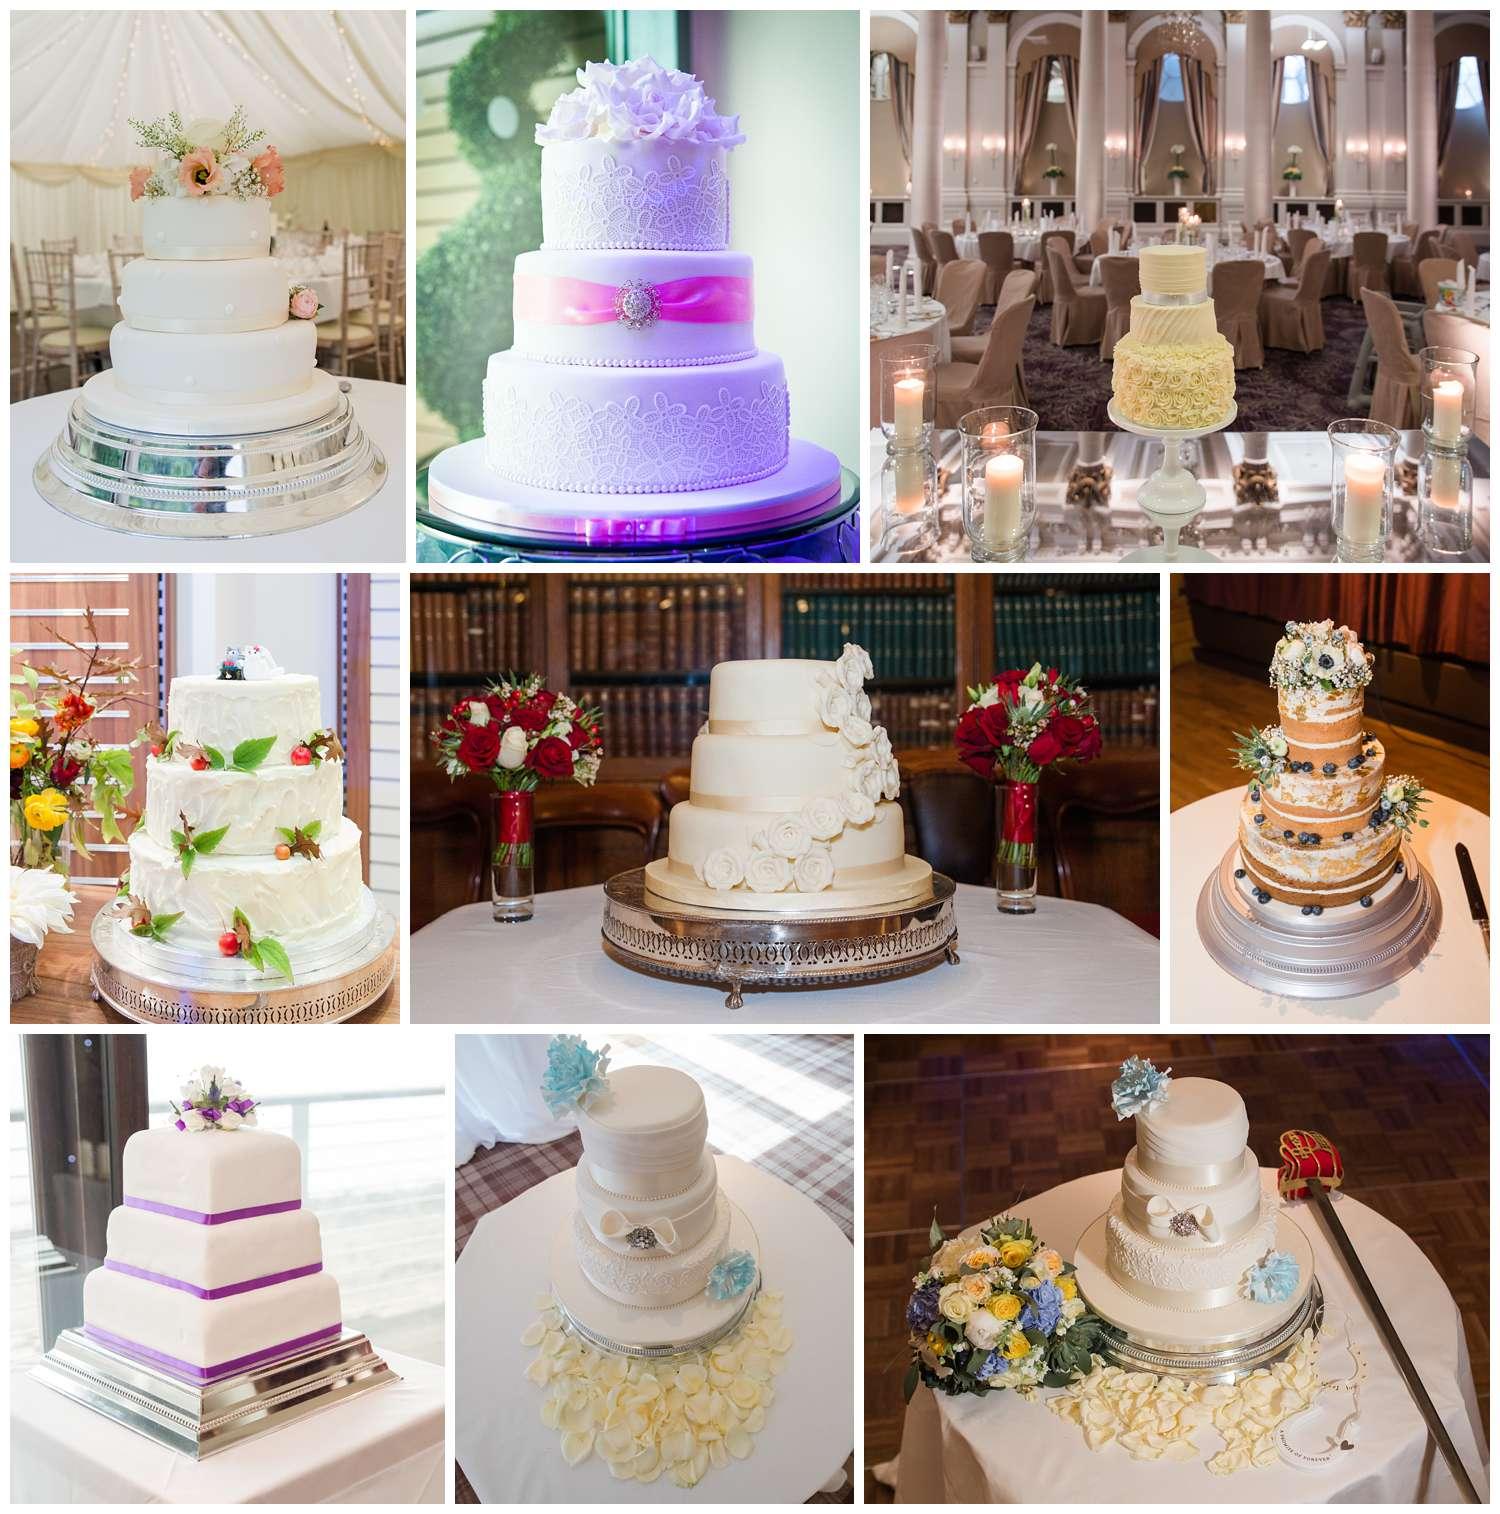 Three-tier wedding cake ideas, ideas for your wedding cake